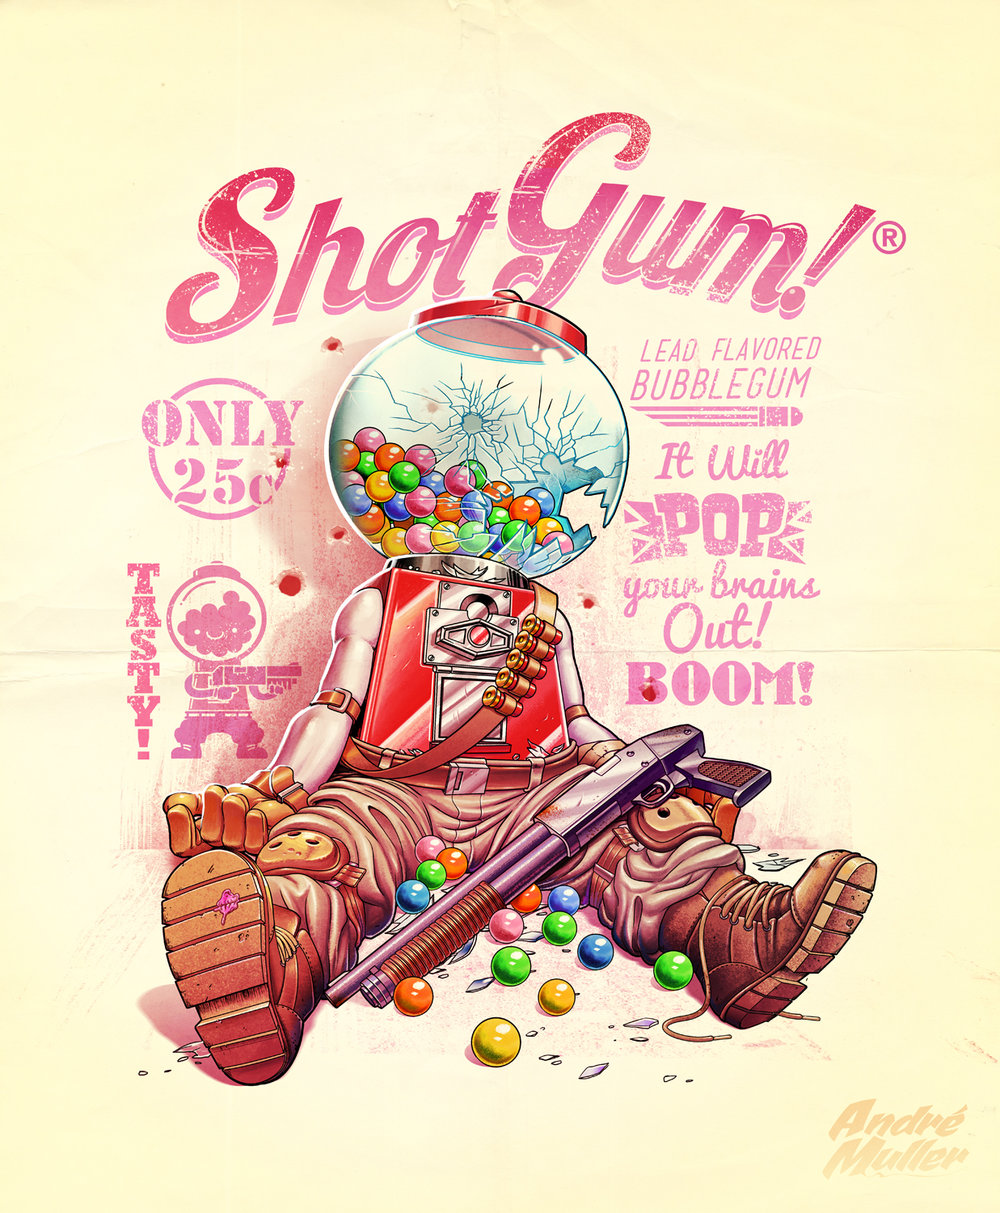 shot gum1.jpg